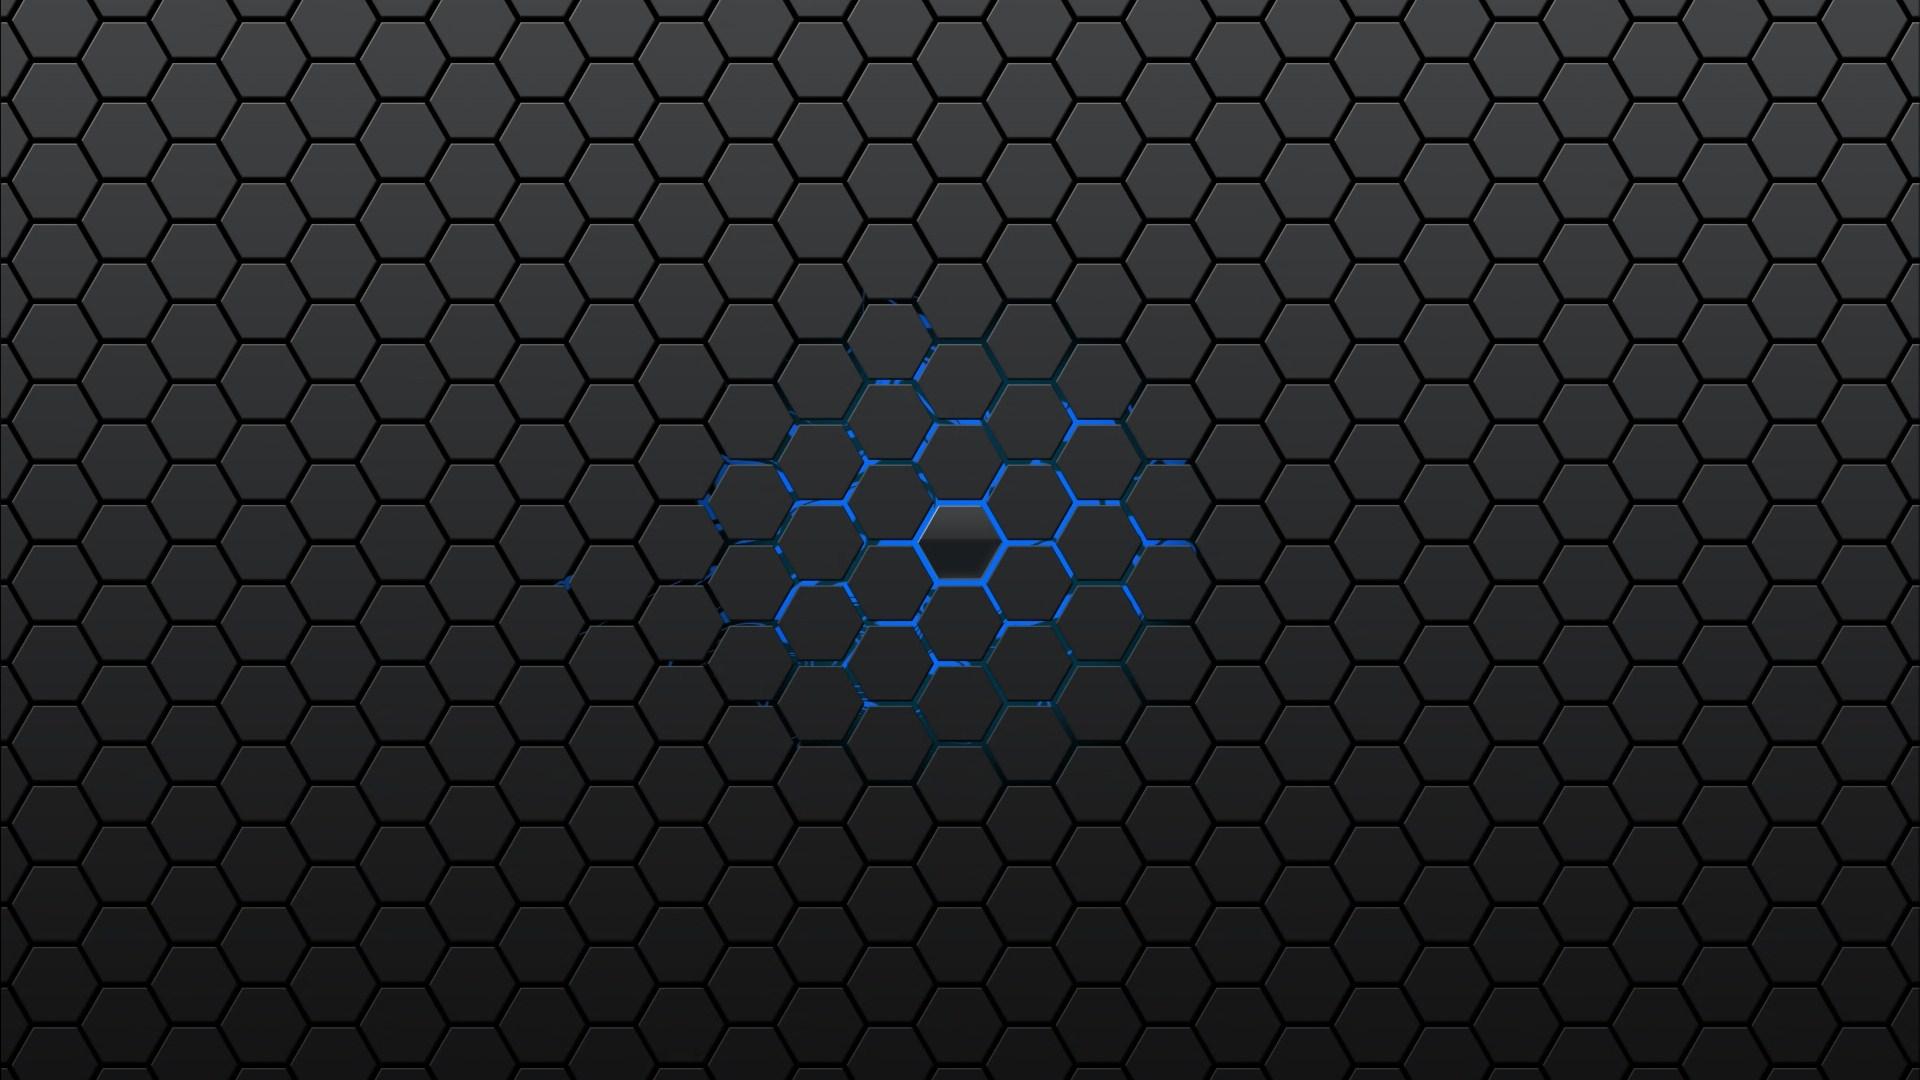 46+] 4K Pattern Wallpaper on WallpaperSafari